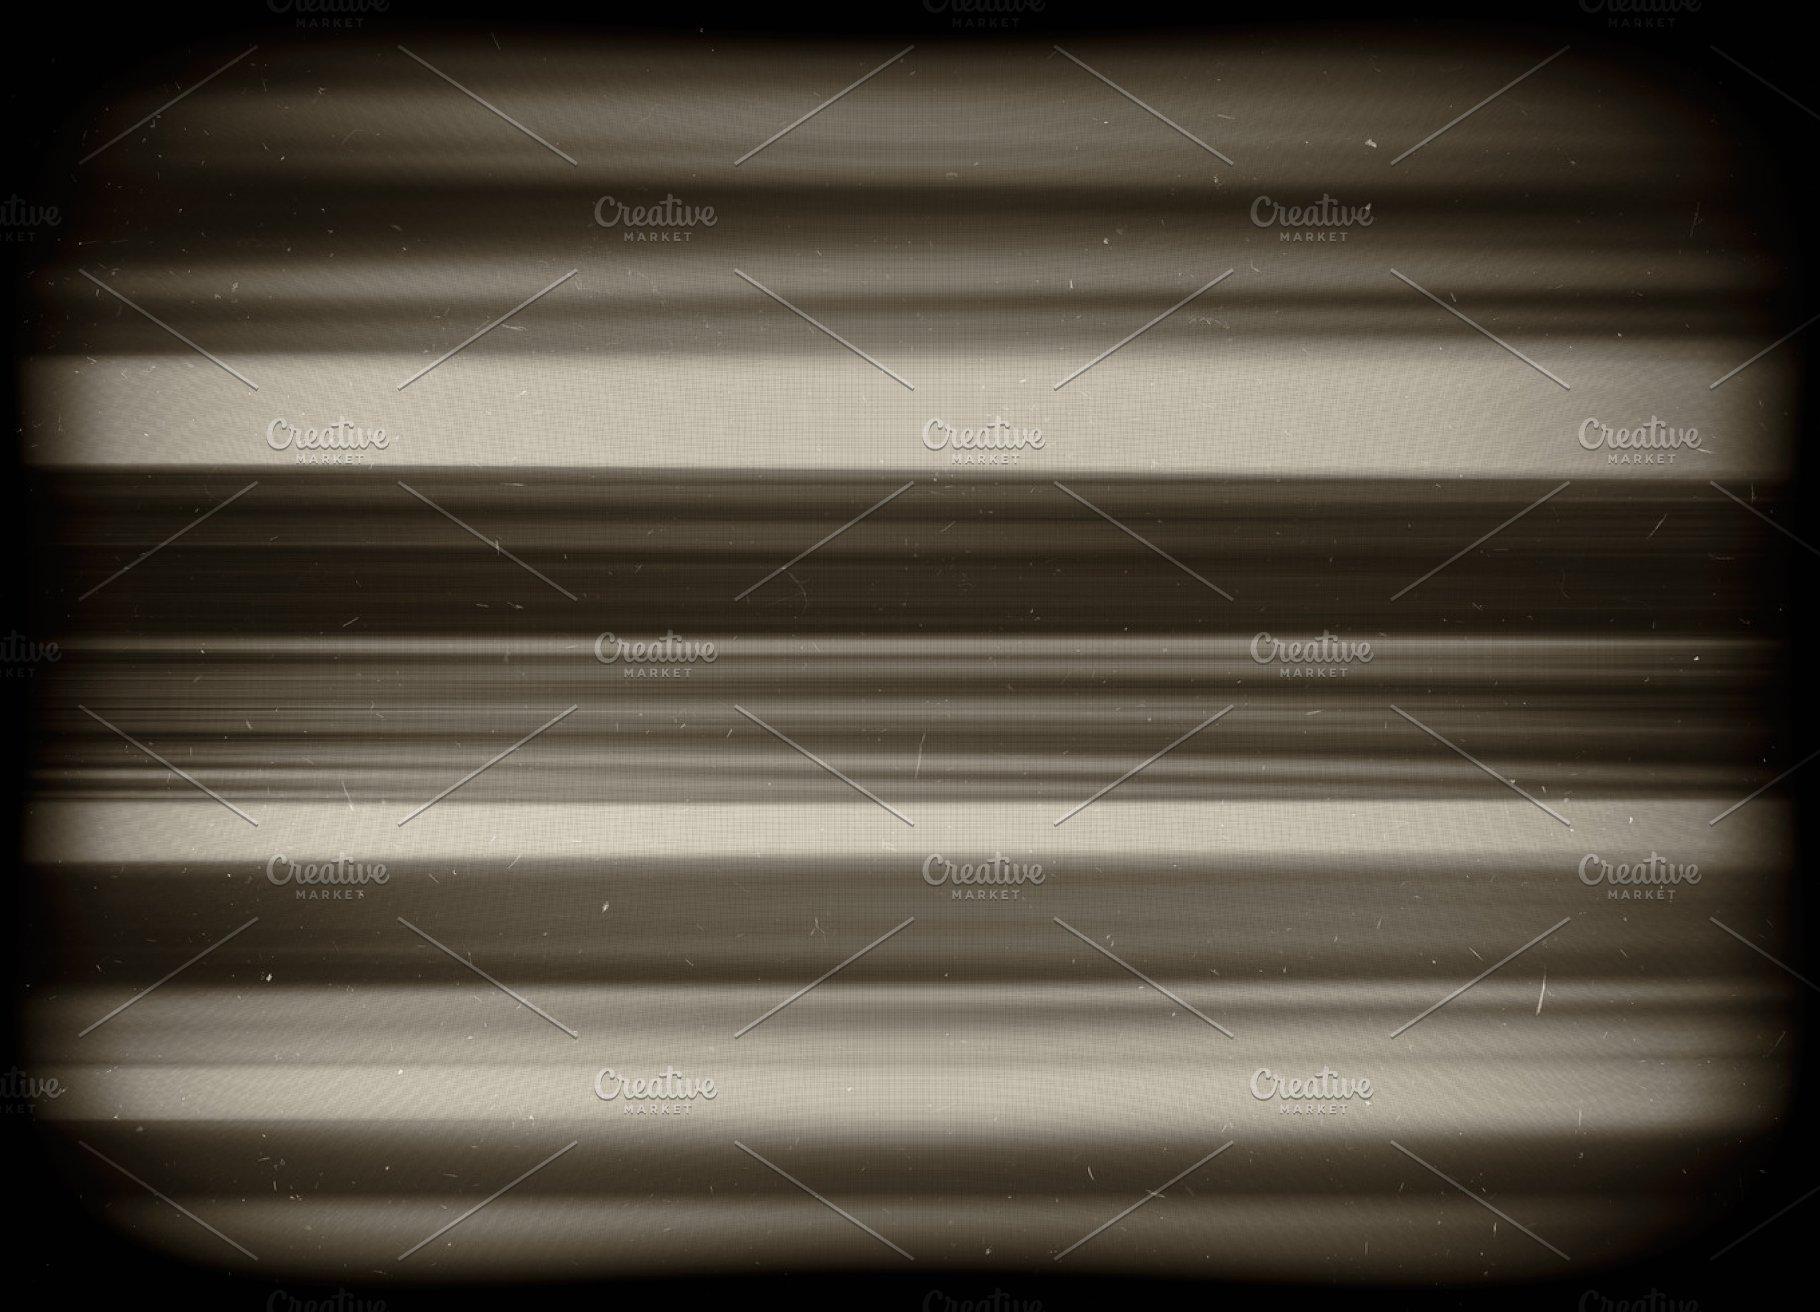 Horizontal vivid green interlaced tv static noise lines abstract